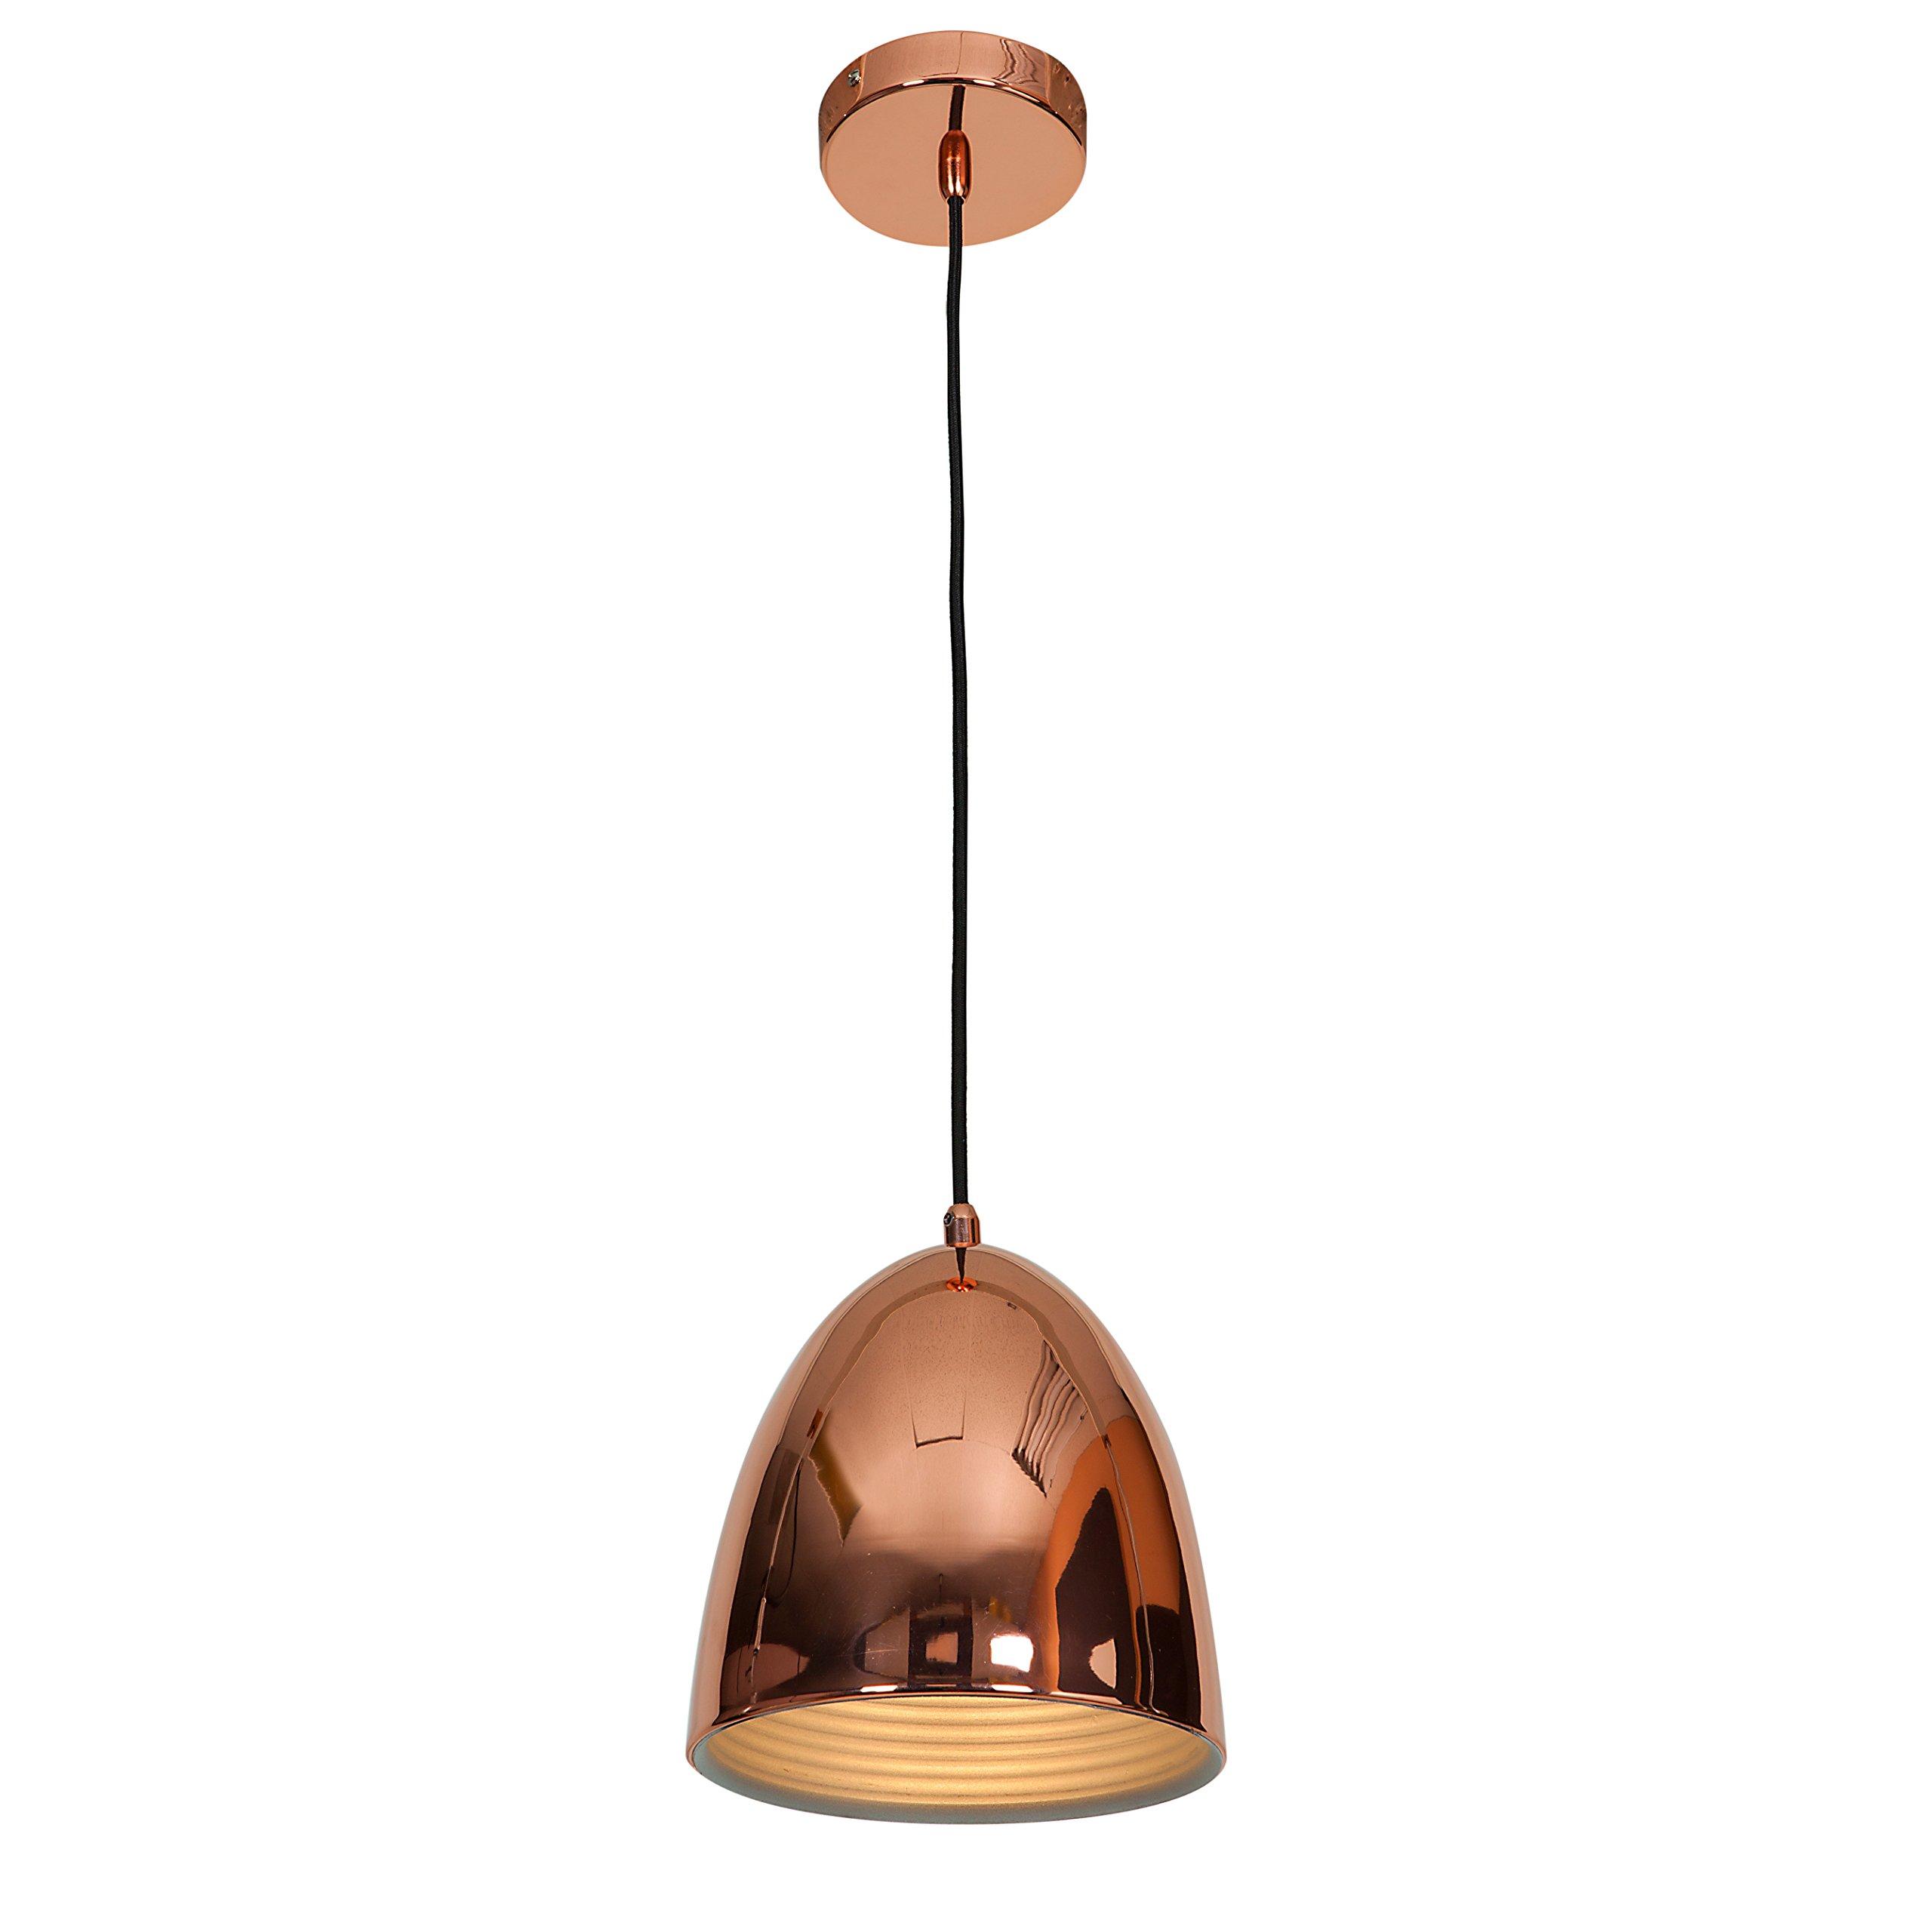 Access Lighting 28090-SCP Essence One Light 8-Inch Diameter Dome Pendant Finish, Shiny Copper